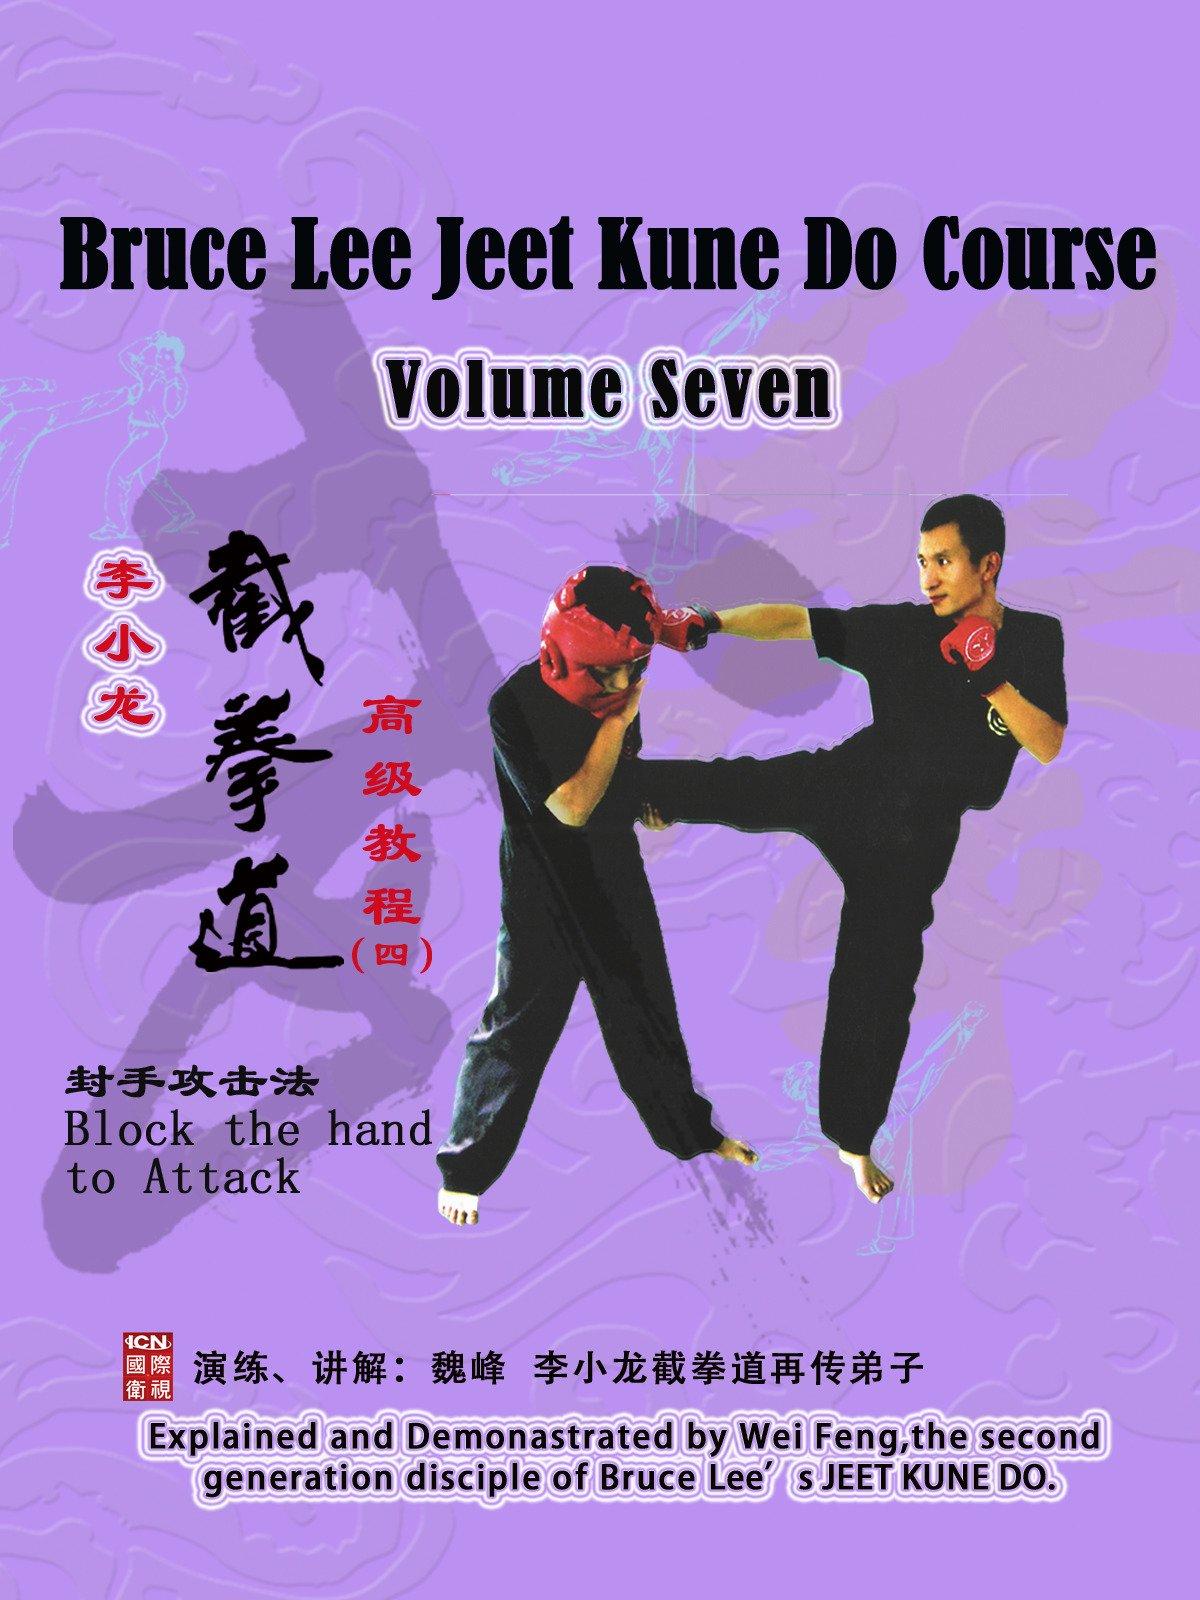 Bruce Lee Jeet Kune Do Course Volume Seven